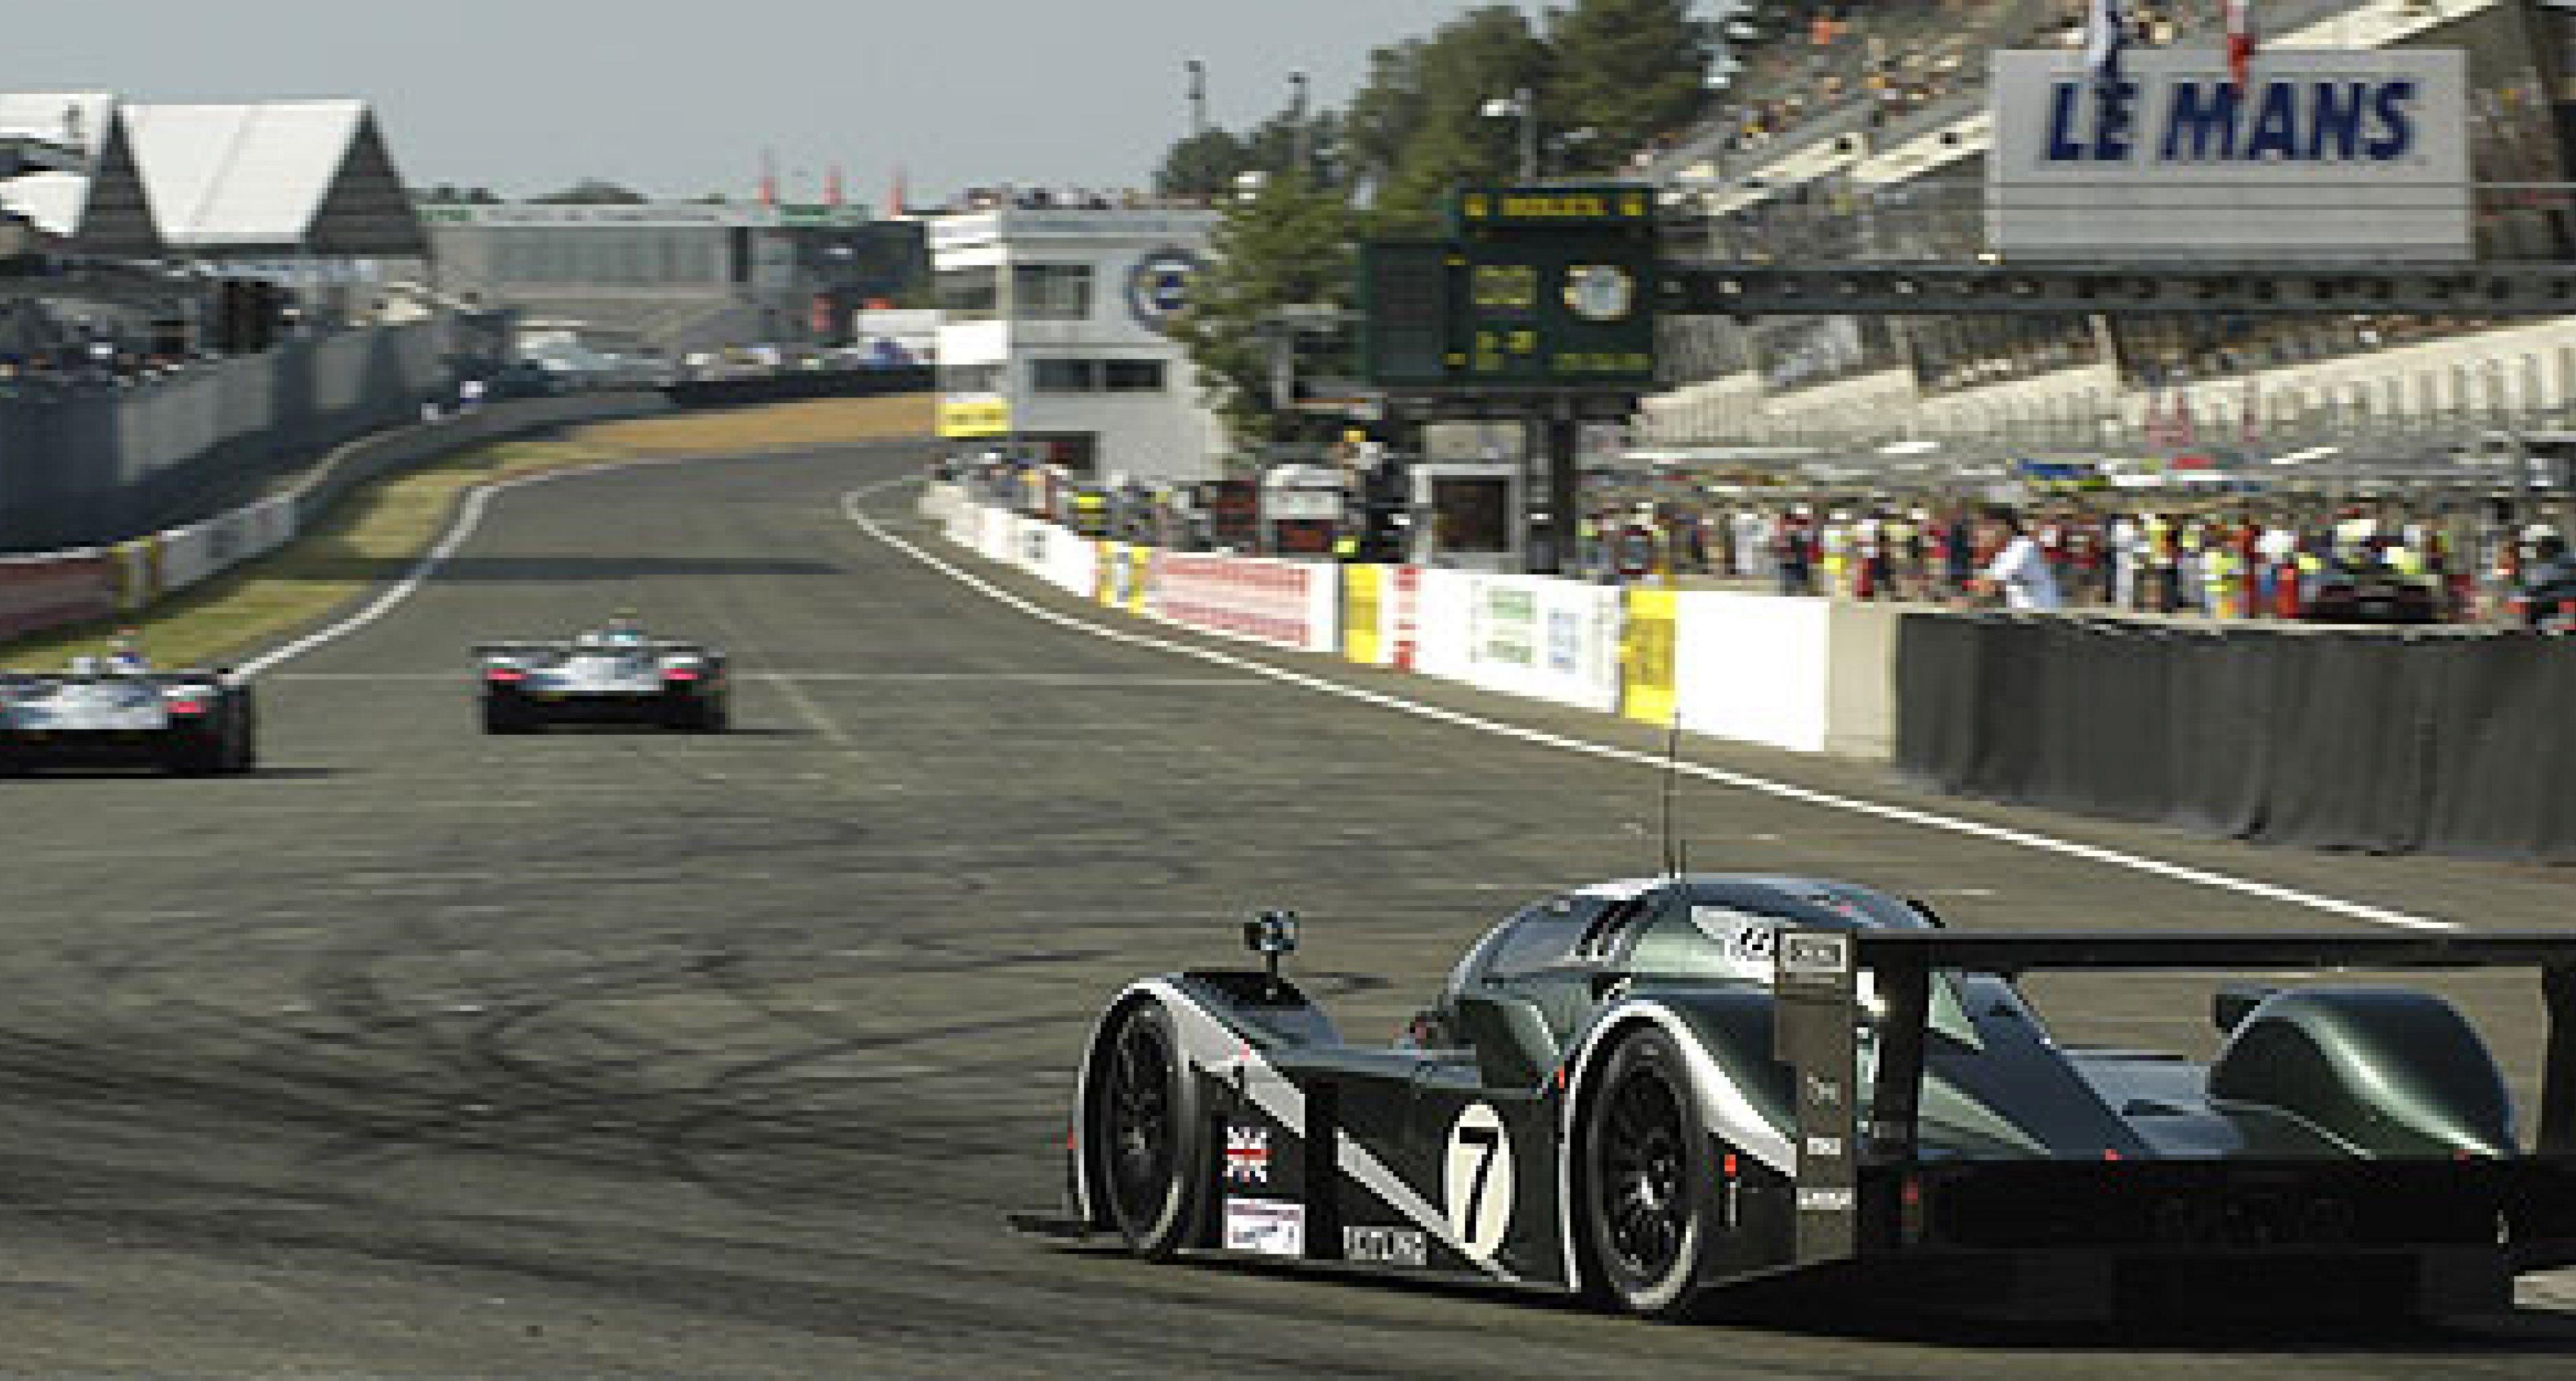 Einzigartiges 1000-Kilometer-Rennen am 9. November in Le Mans